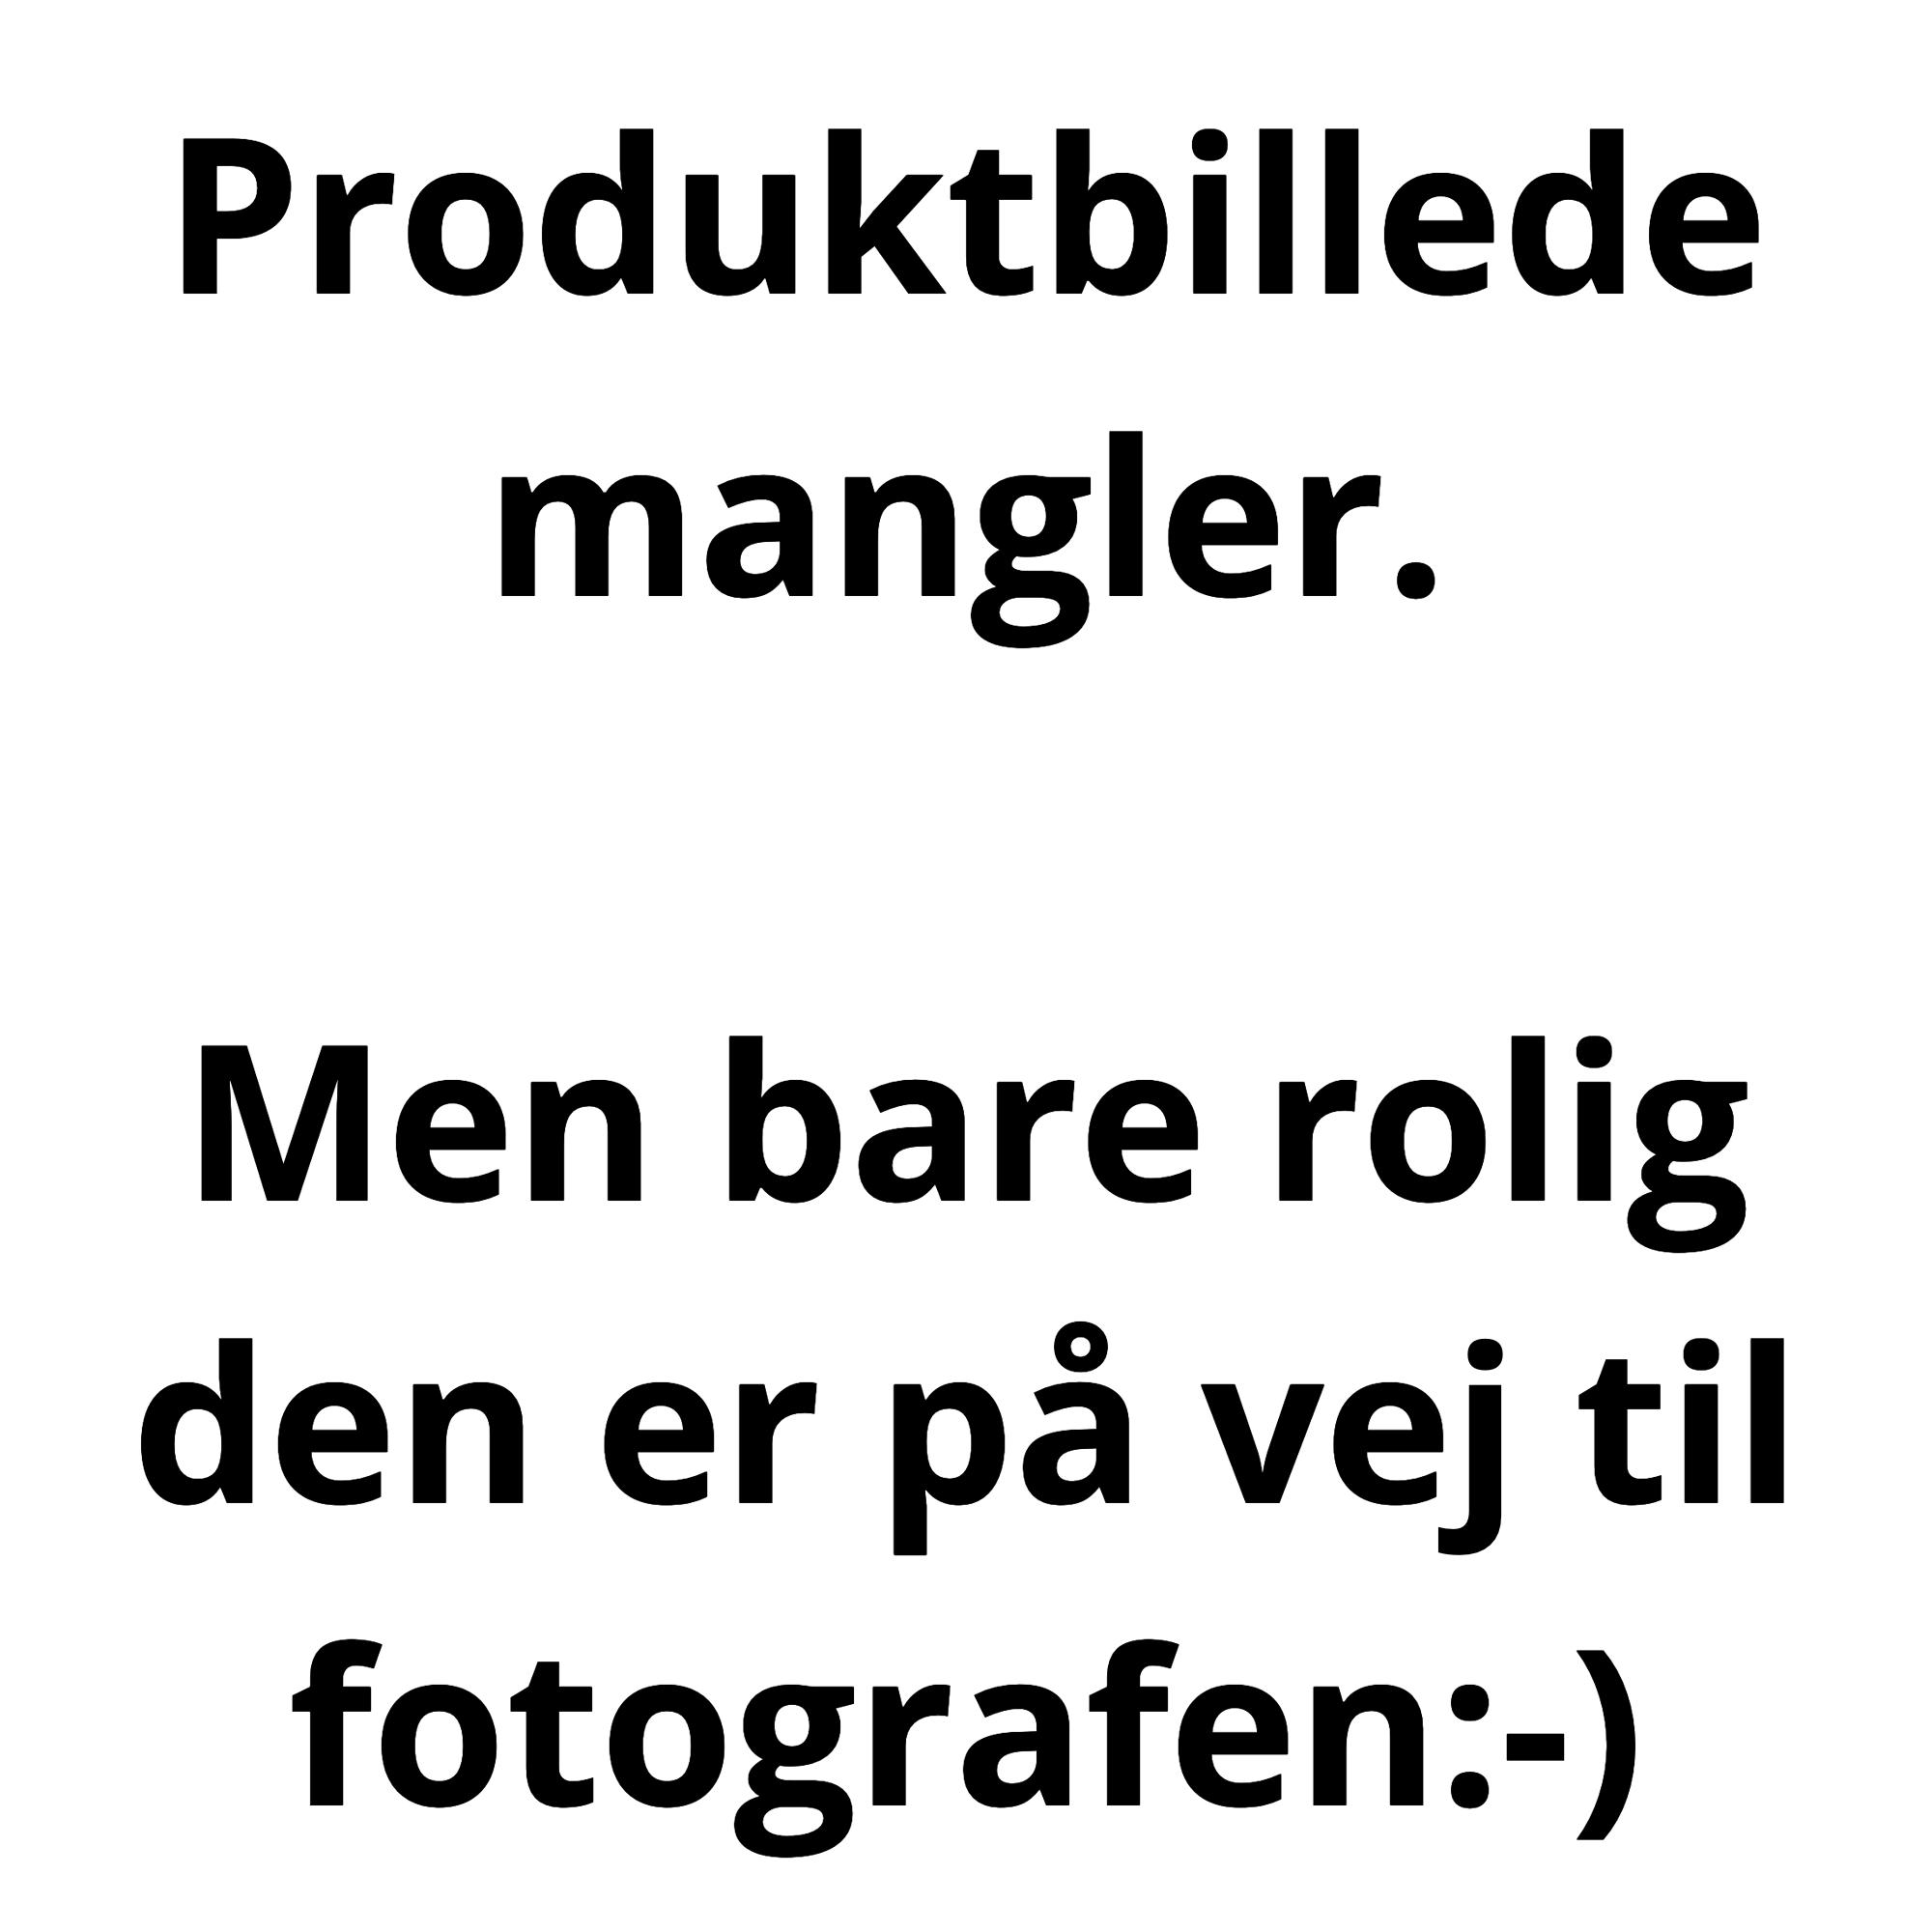 Incipio Octane Beskyttelsescover til Apple iPhone 8/7- frost/sort